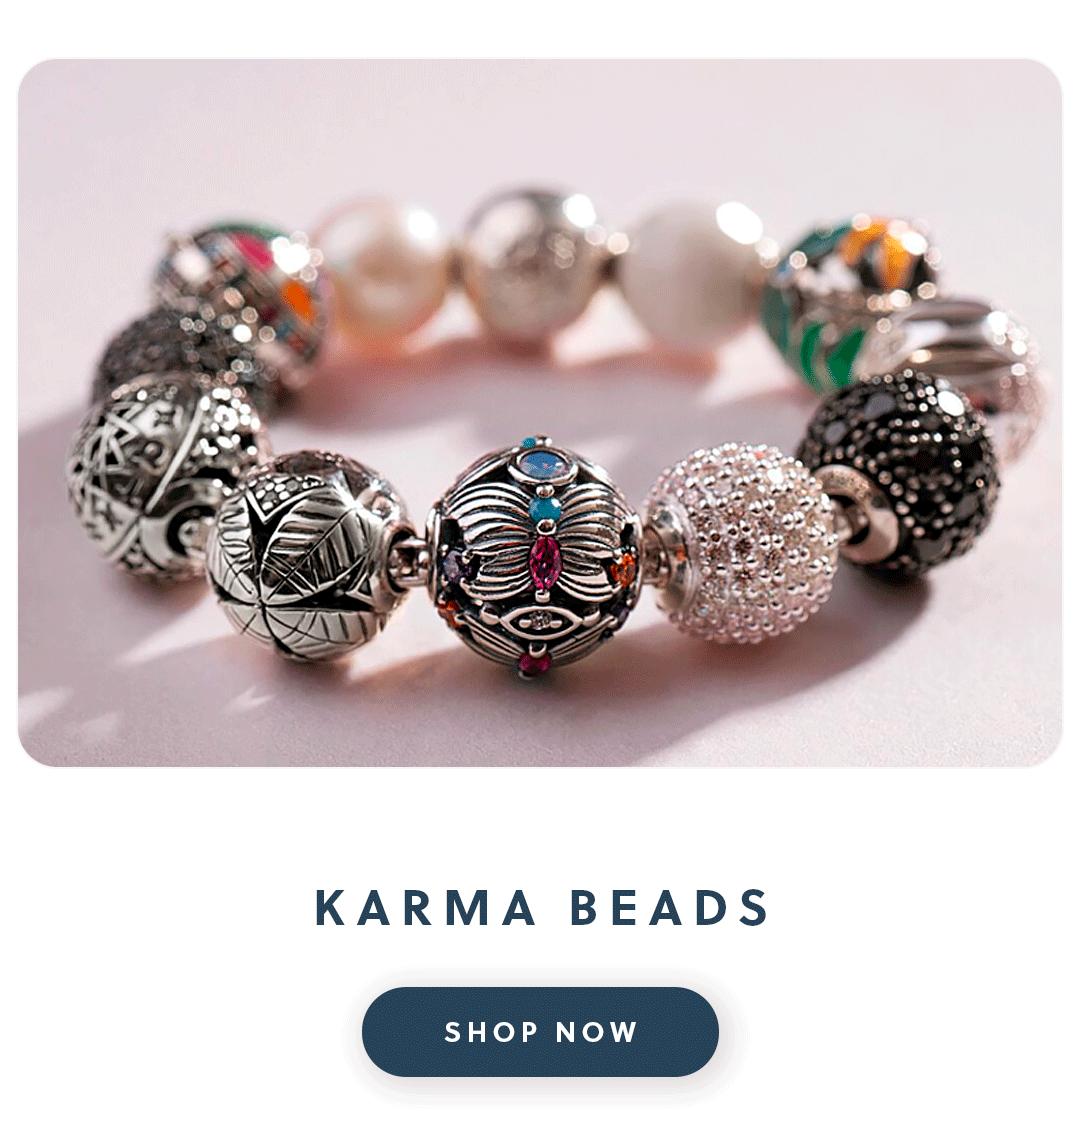 A thomas sabo karma bead bracelet full of karma beads with text karma beads shop now